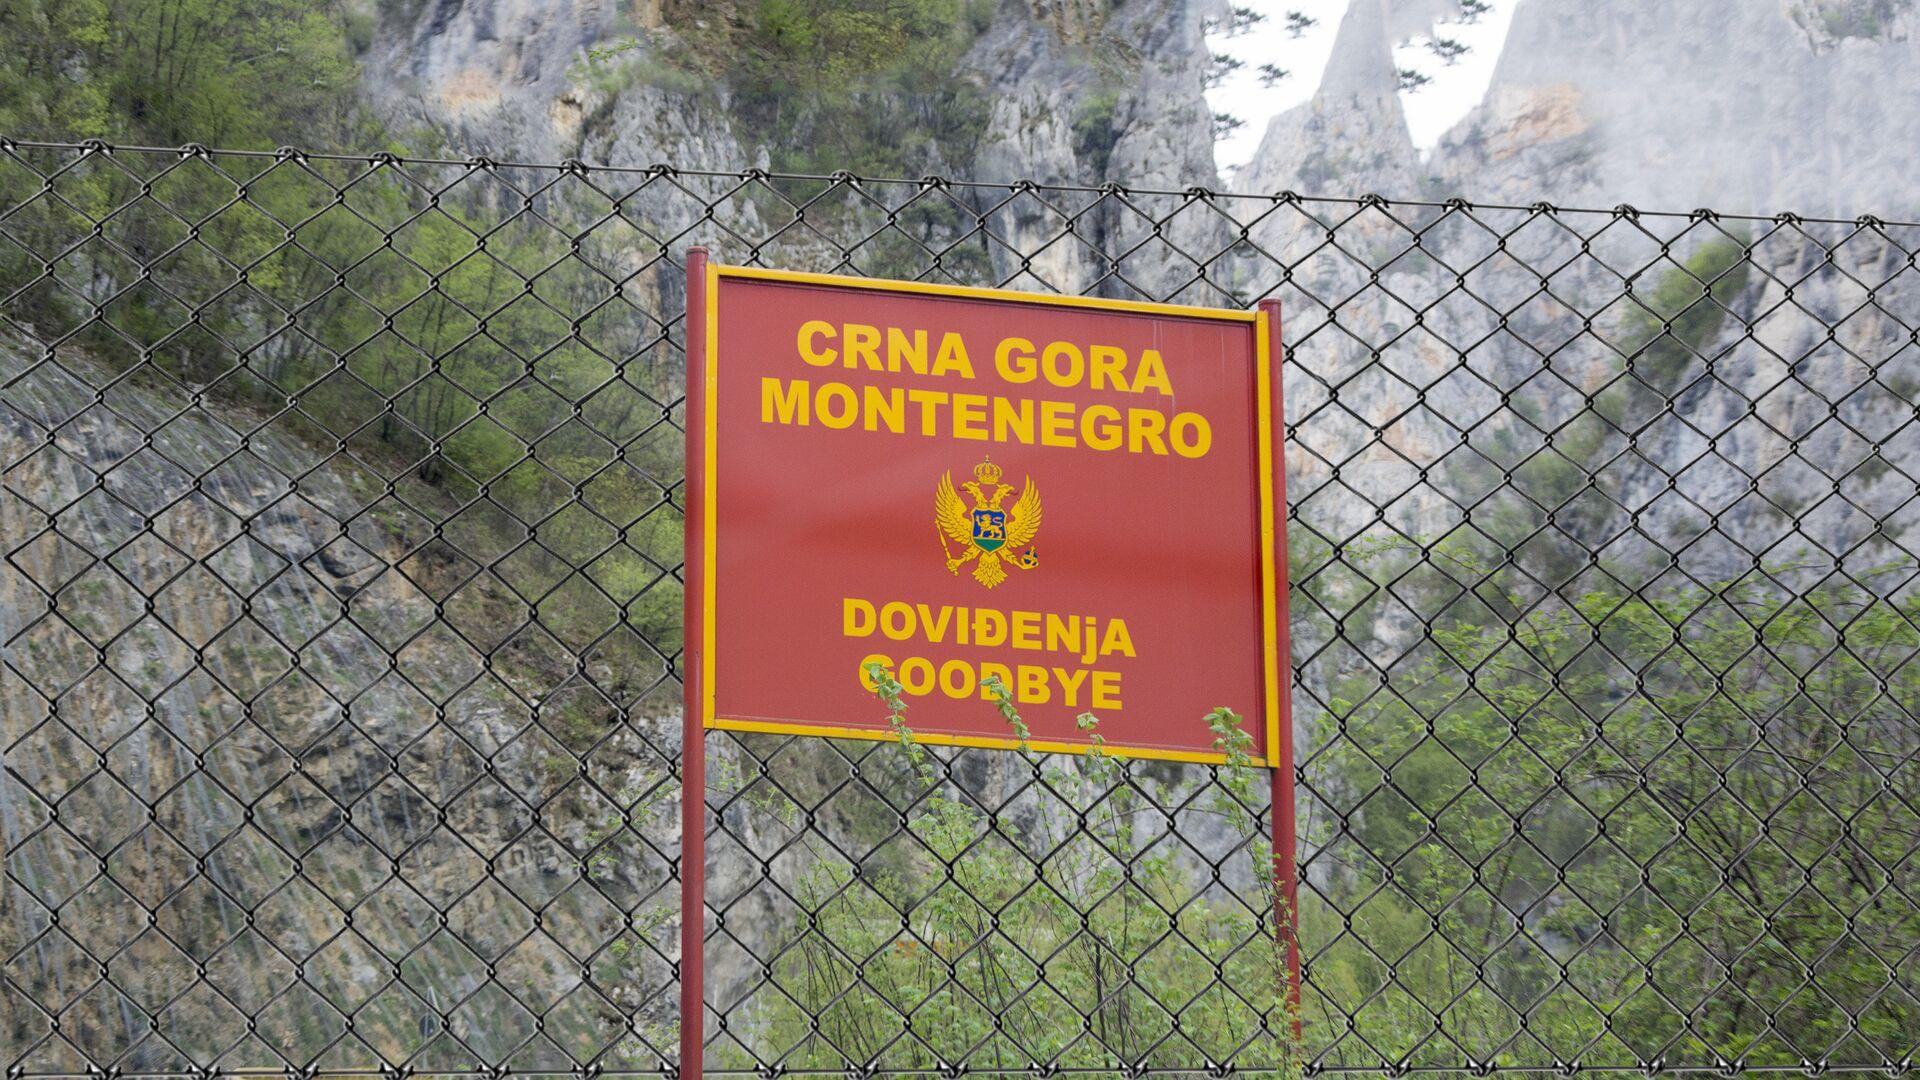 Црна Гора - граница  - Sputnik Србија, 1920, 14.09.2021